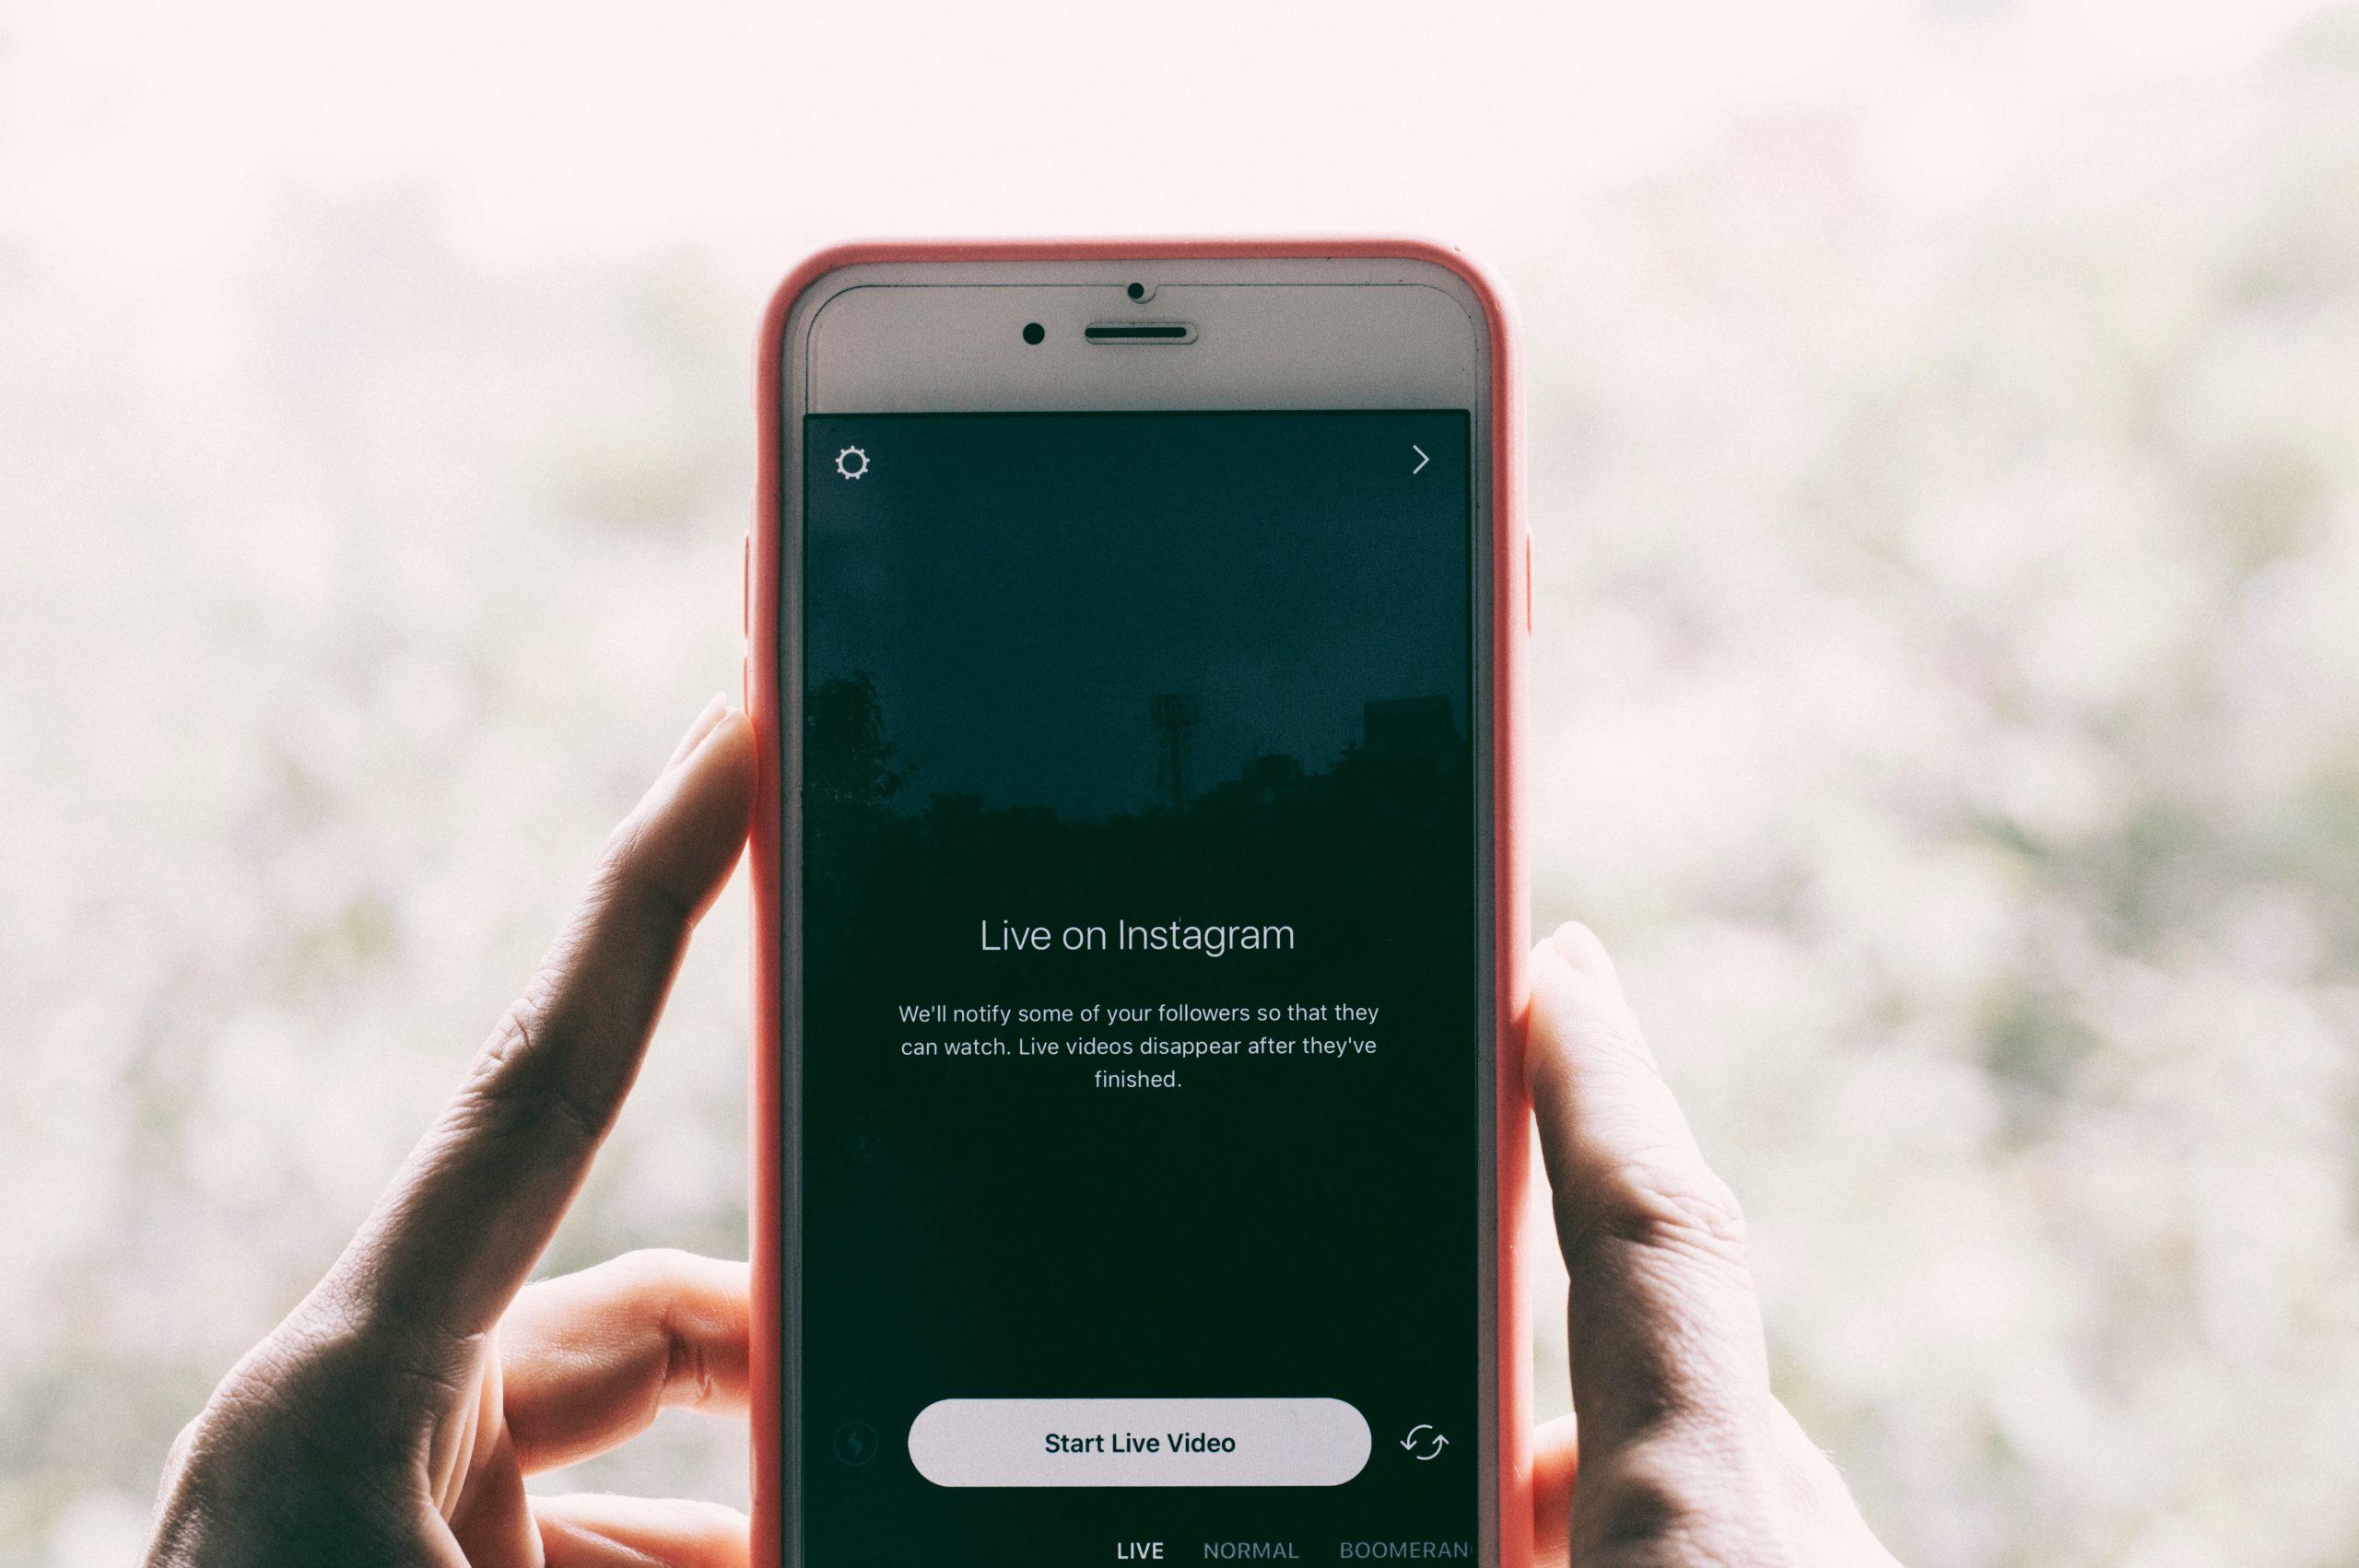 oglasavanje-na-instagramu